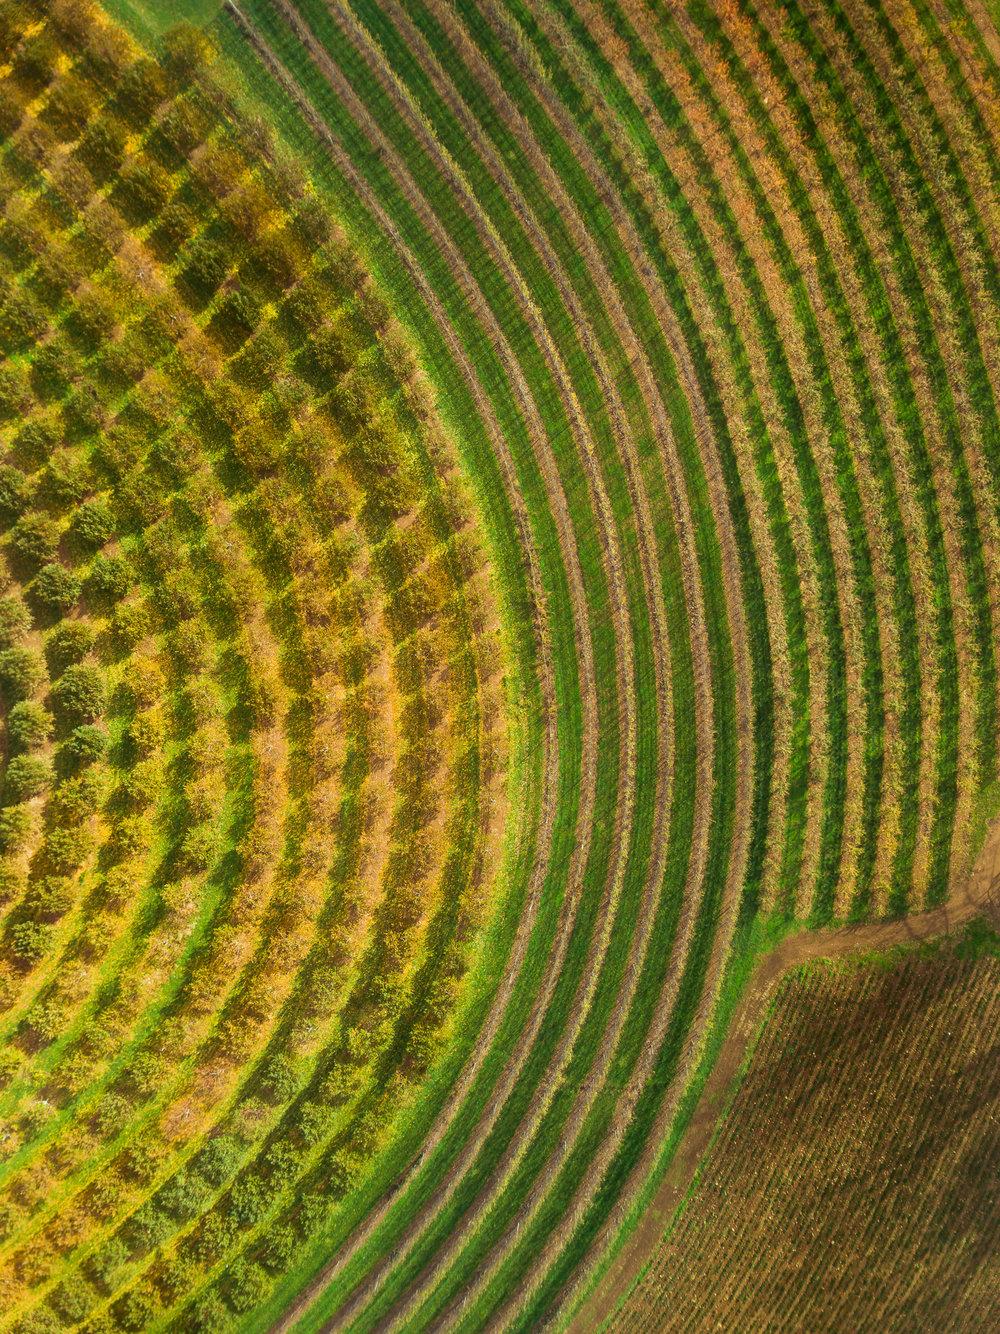 farmpatterncircle_typoland_aerial-1.jpg